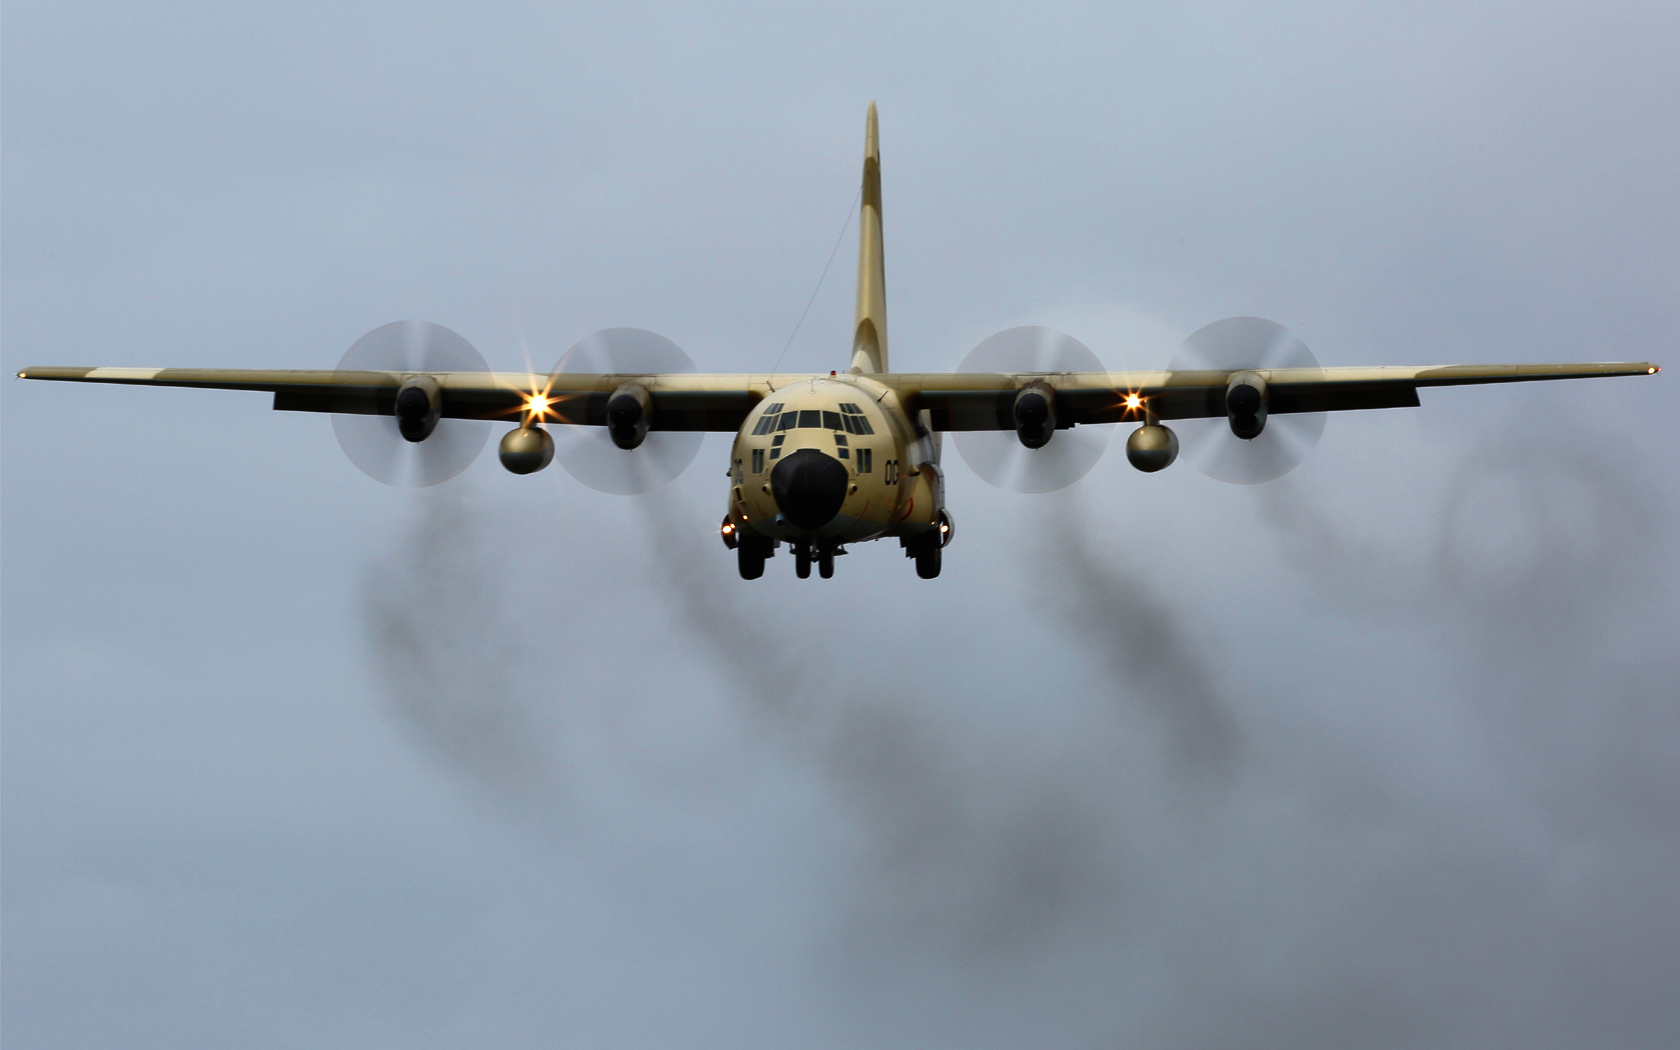 FRA: Photos d'avions de transport - Page 21 16063894843_b739681c22_o